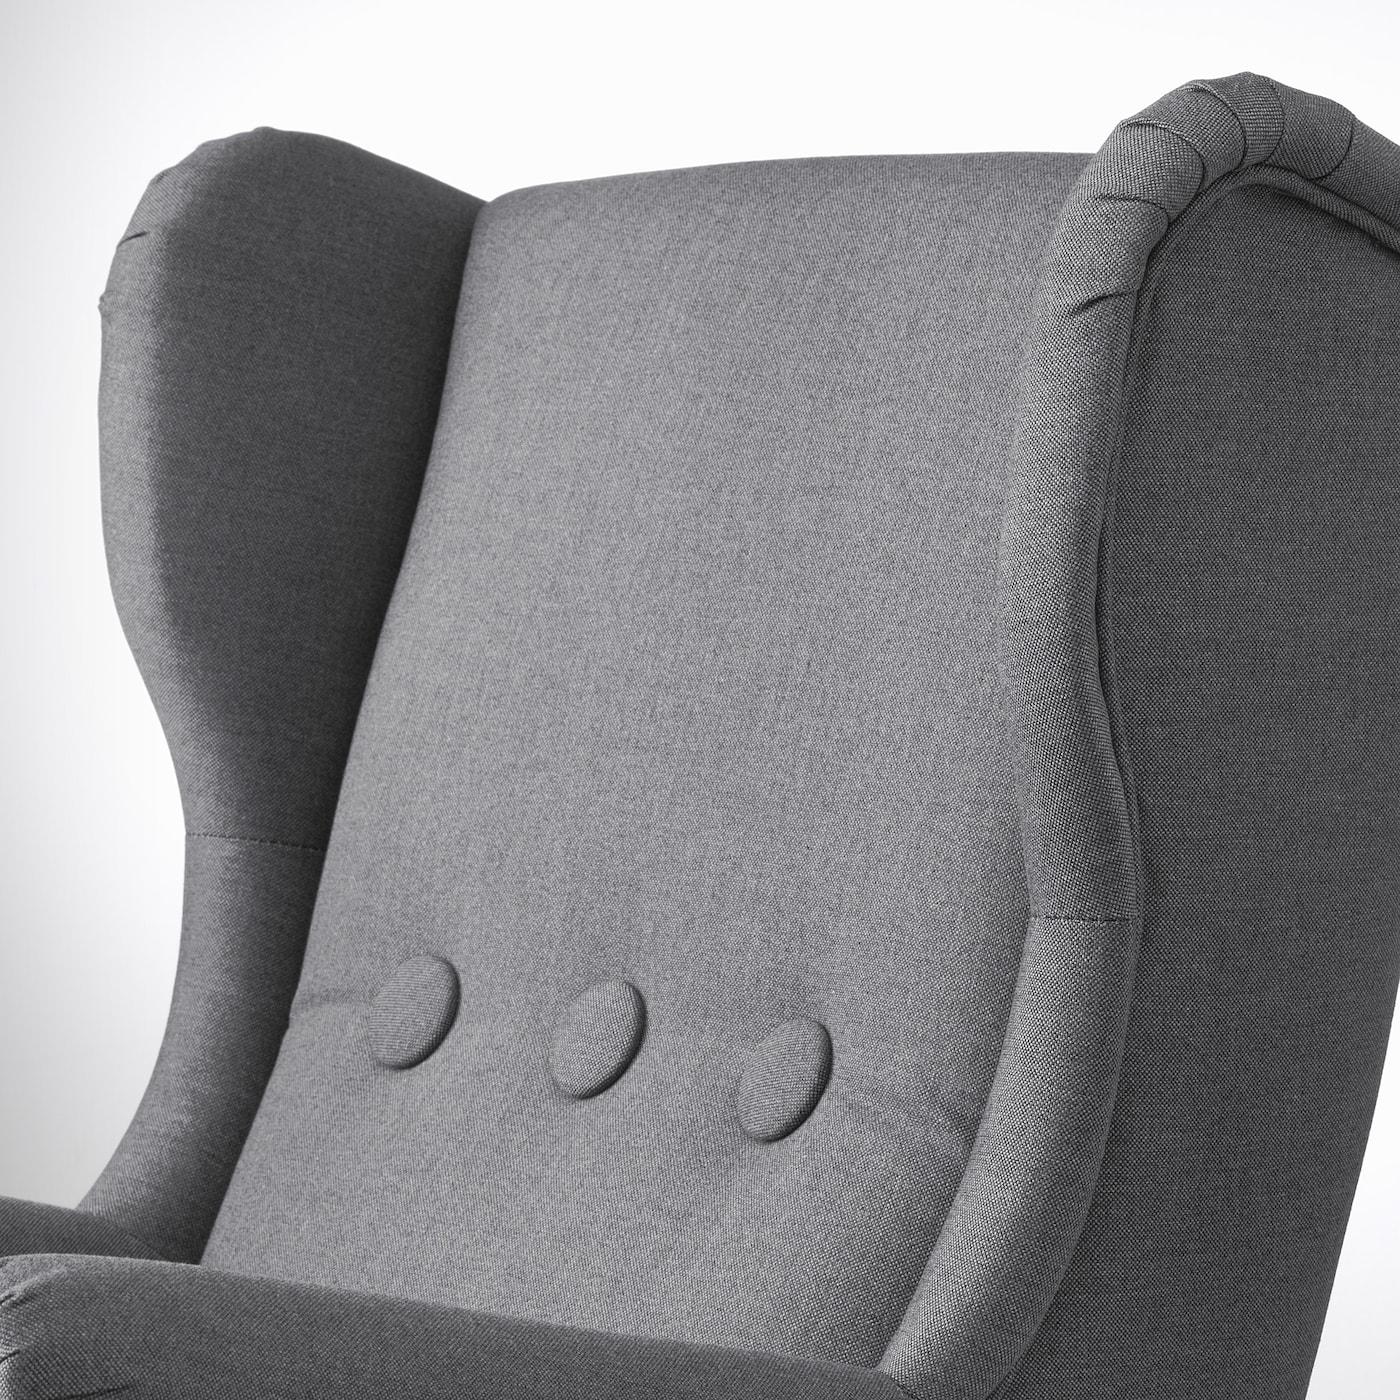 STRANDMON children's armchair Vissle grey 56 cm 62 cm 71 cm 44 cm 41 cm 28 cm